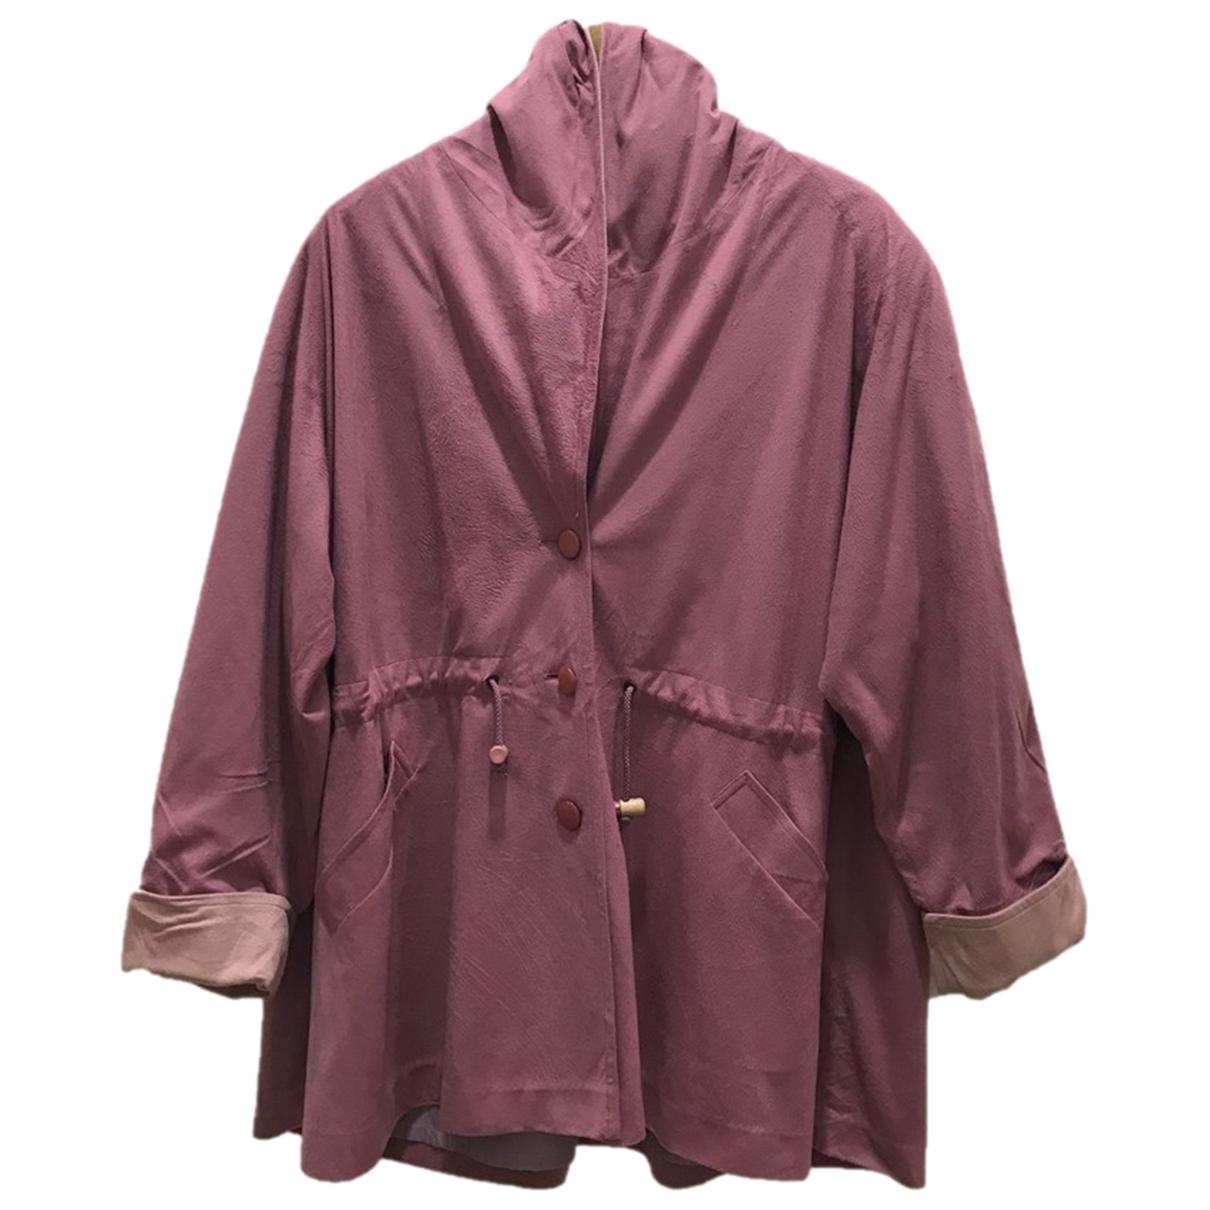 Margaret Howell \N Pink jacket for Women M International